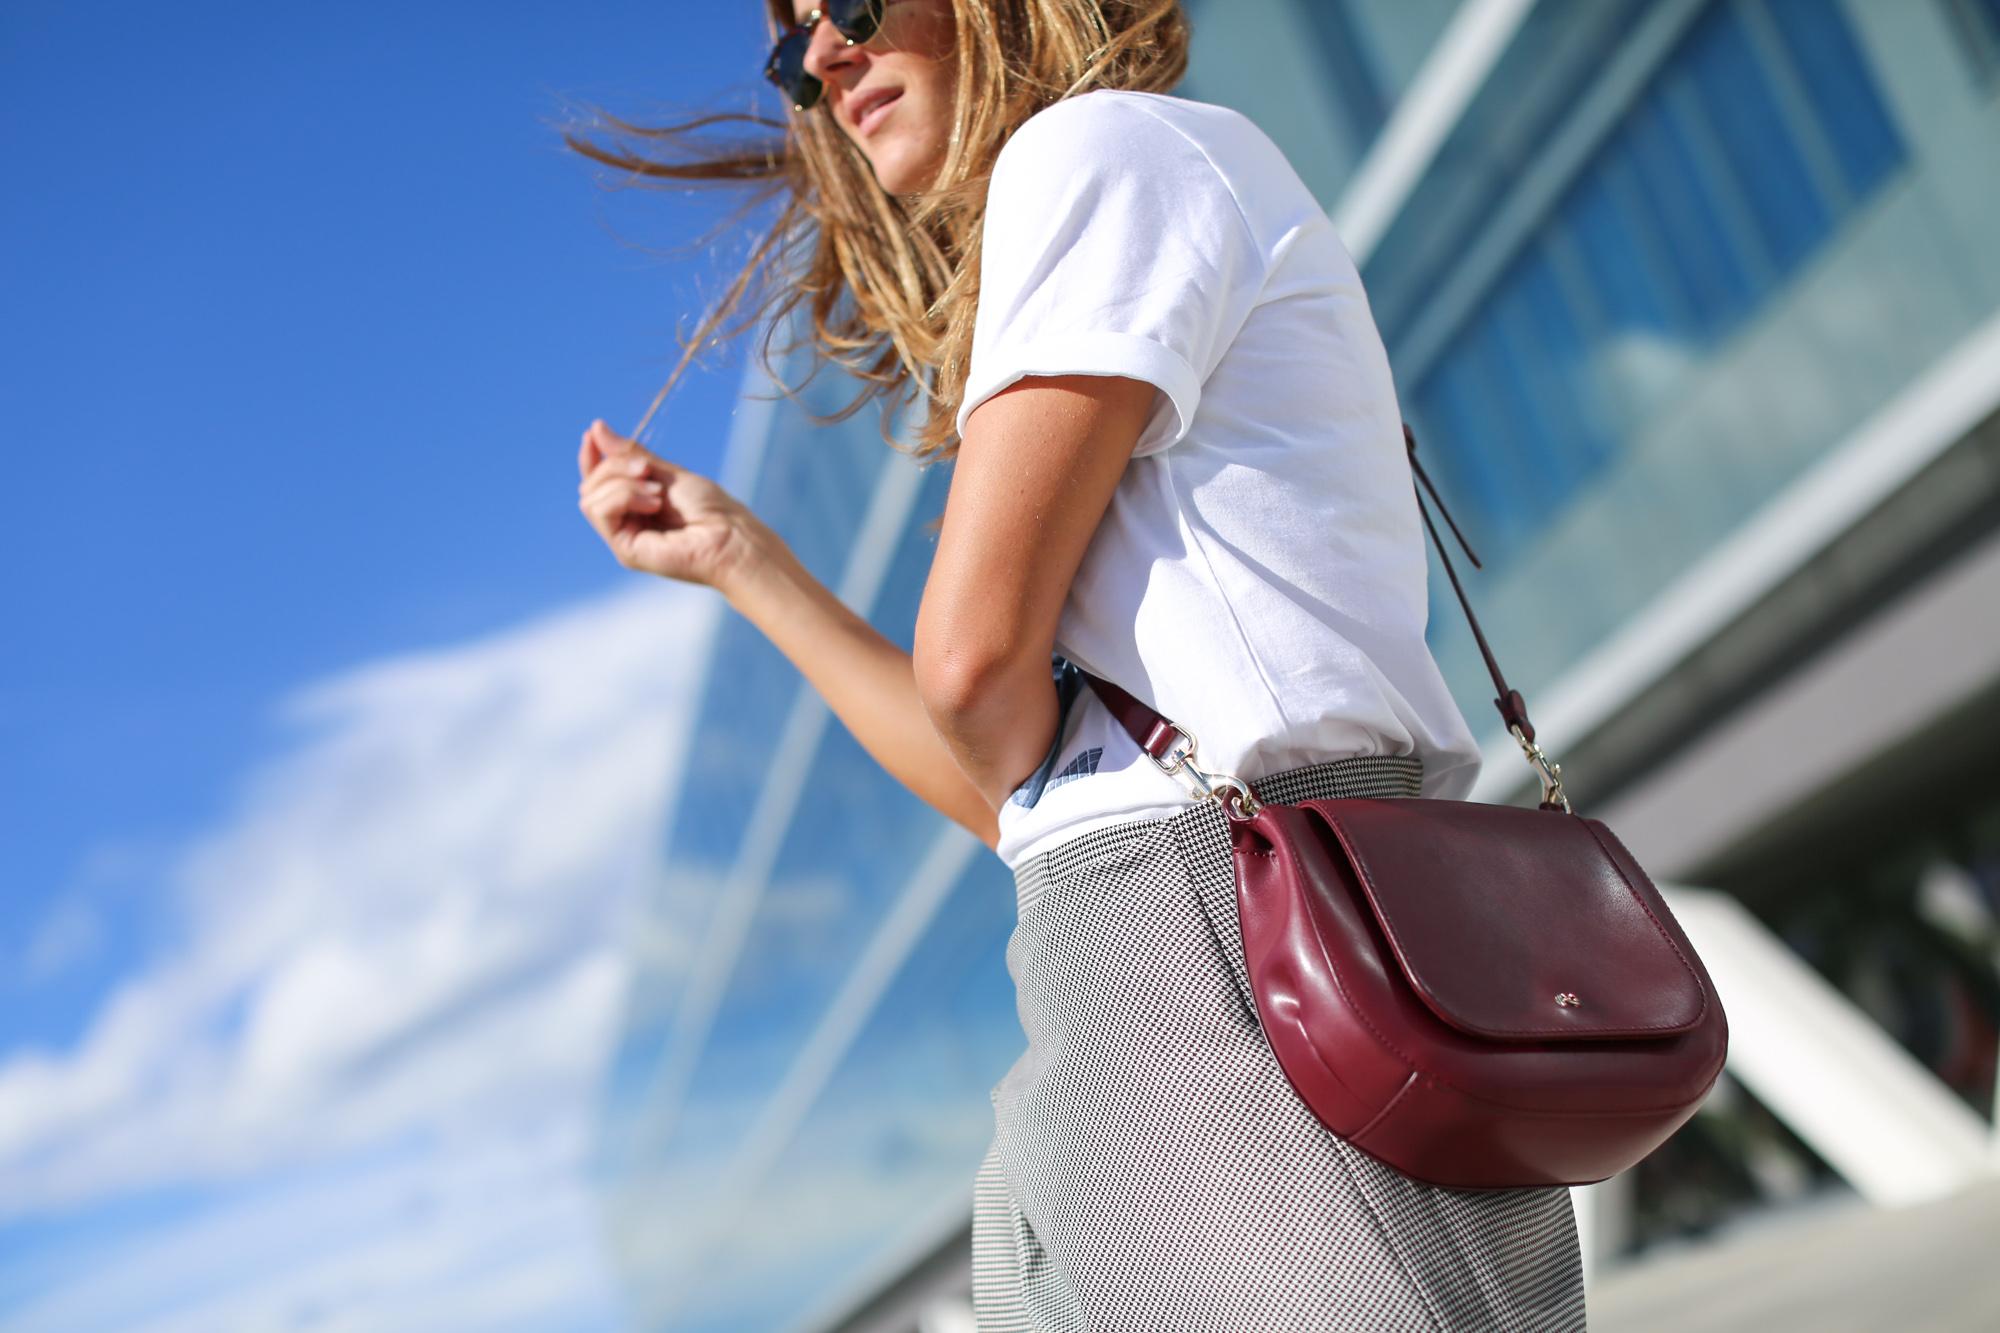 clochet_streetstyle_fashionblogger_leatherloafers_zara_asymmetric_toothgooseminiskirt-9